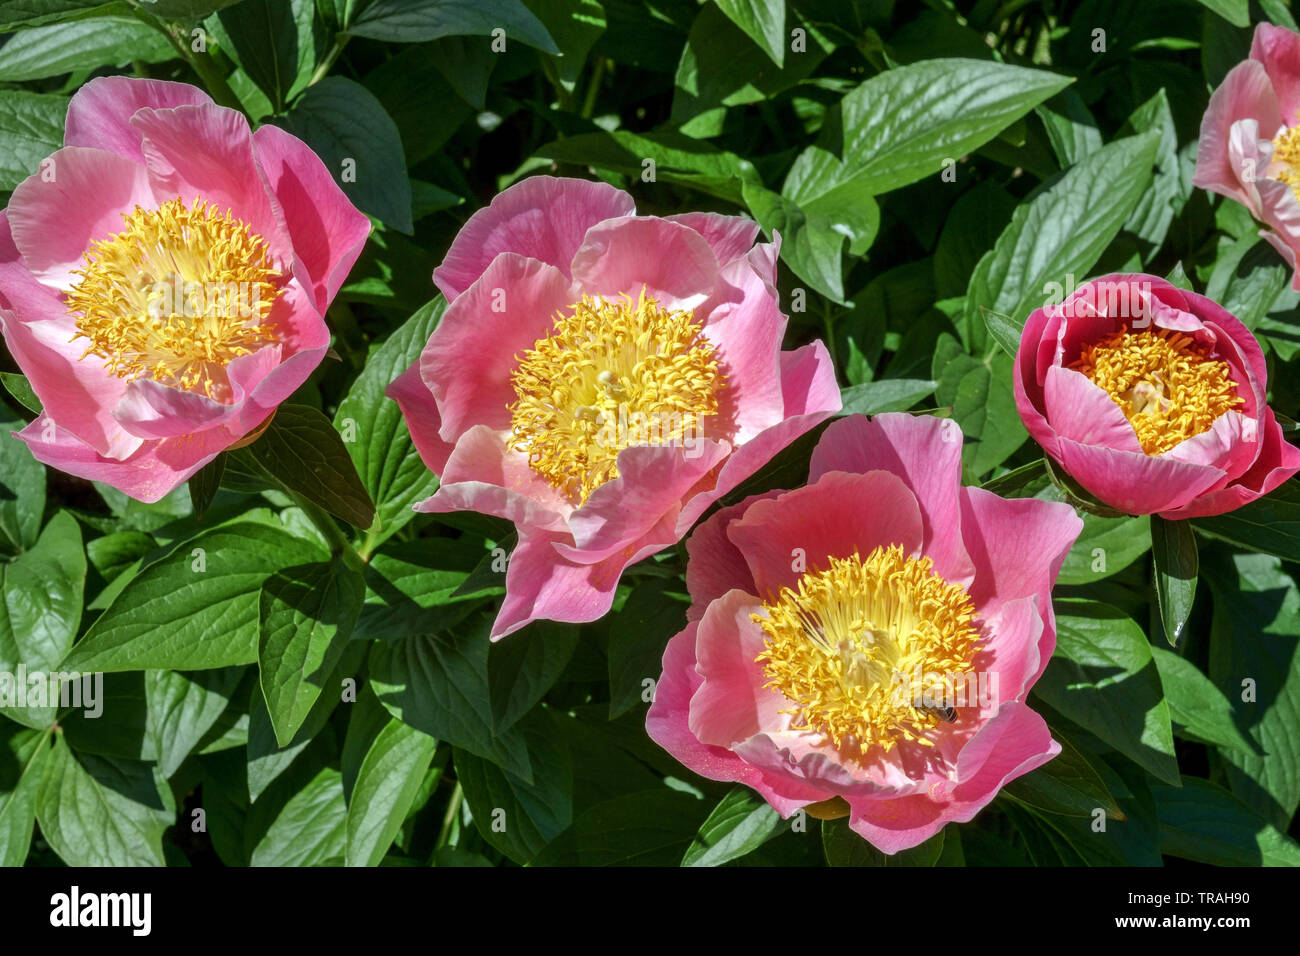 Paeonia lactiflora 'Gedenken', Pink peony, Peonies - Stock Image